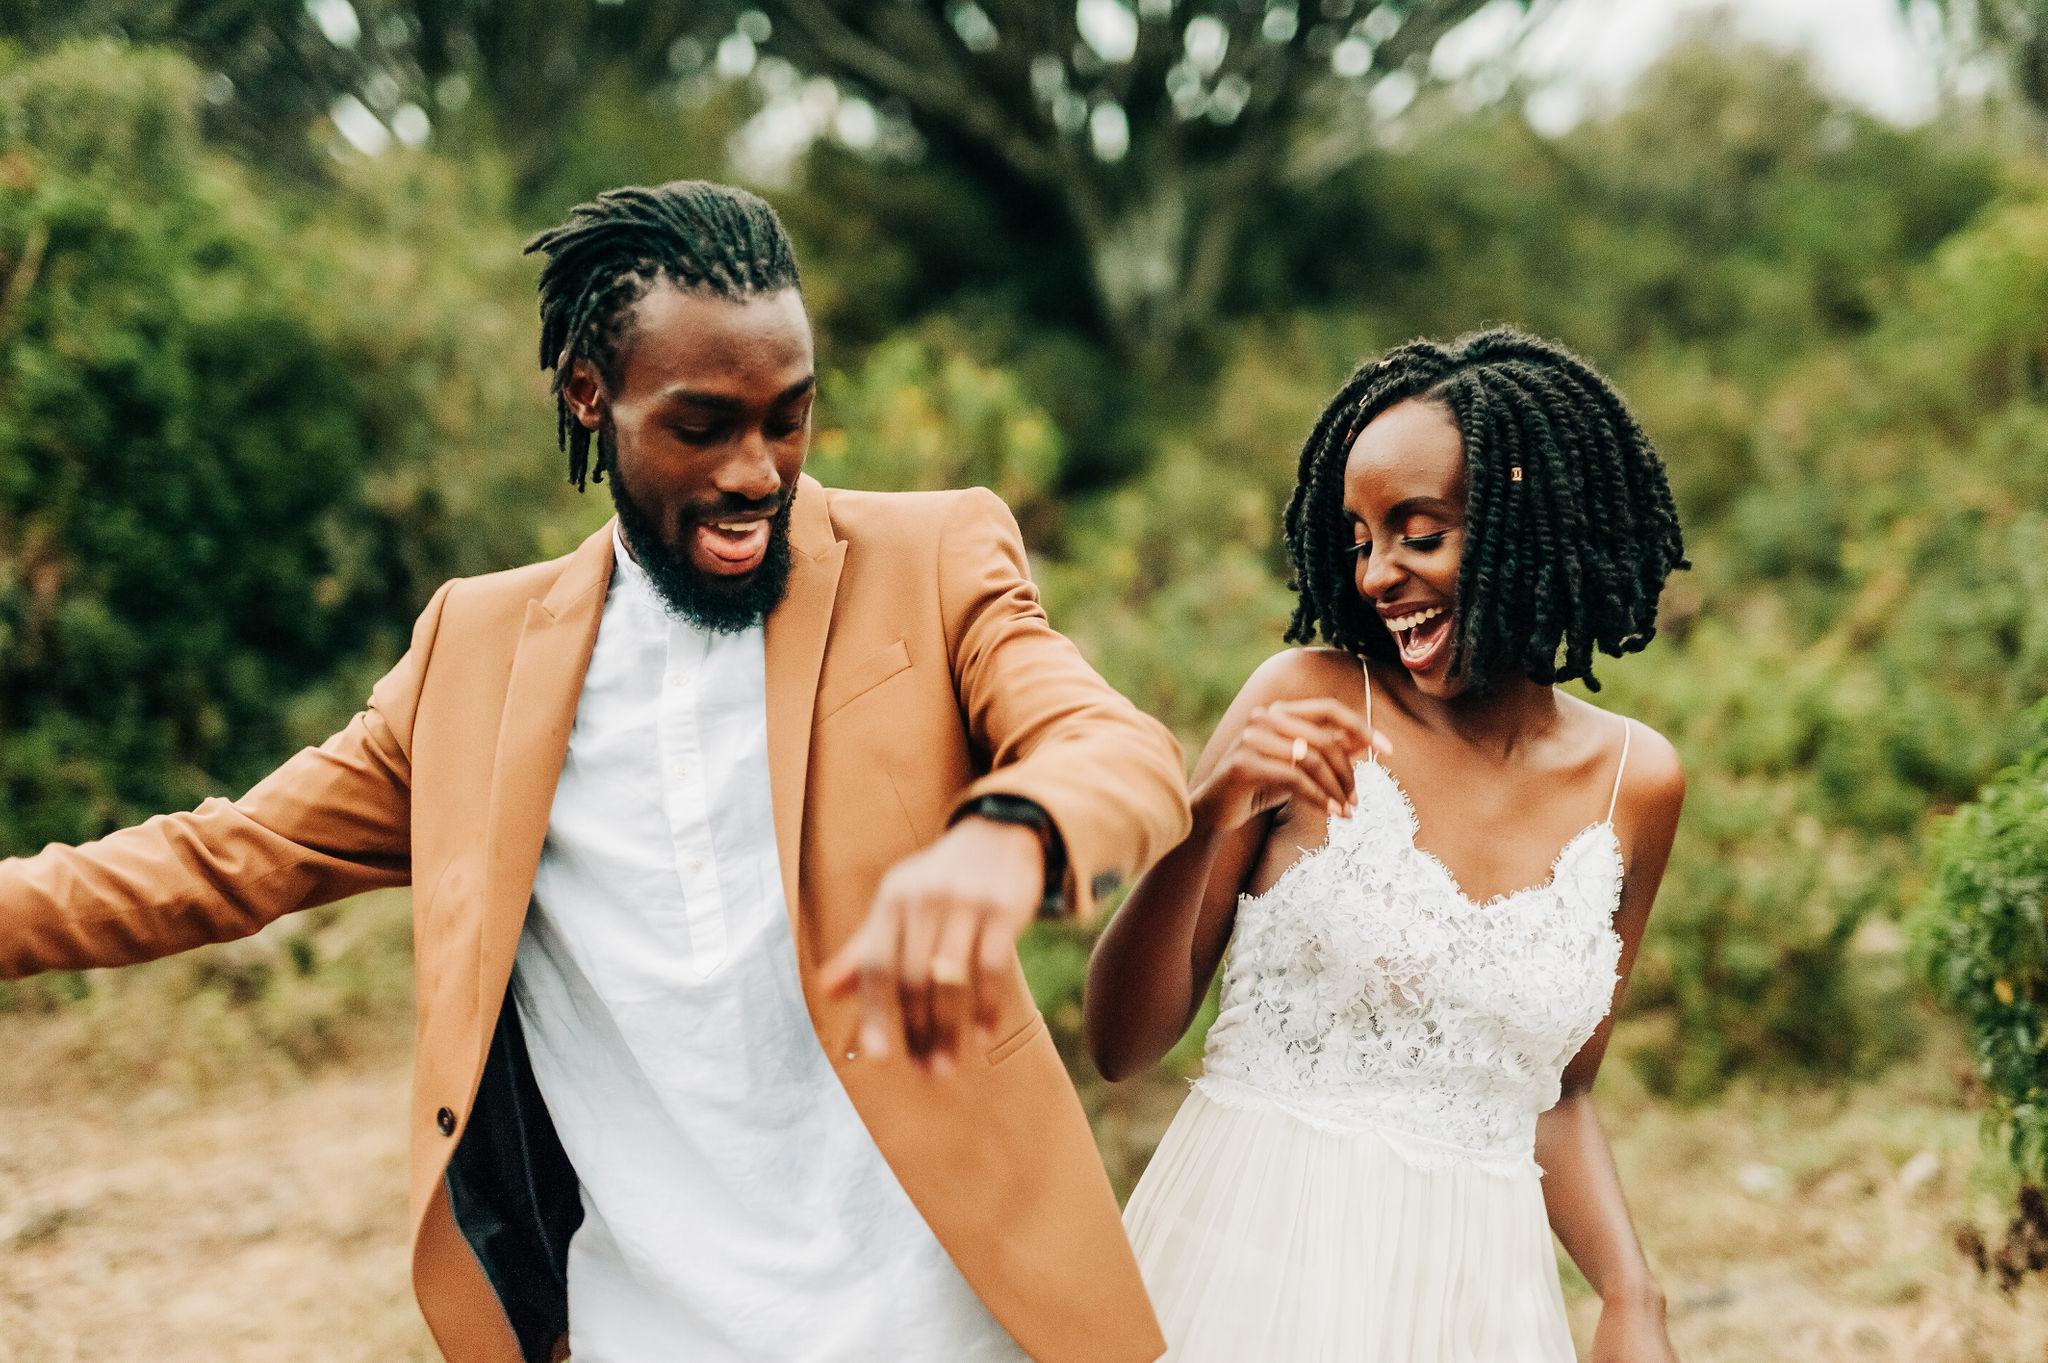 Anna-Hari-Photography-Destination-Wedding-Photographer-Kenya-272.jpg